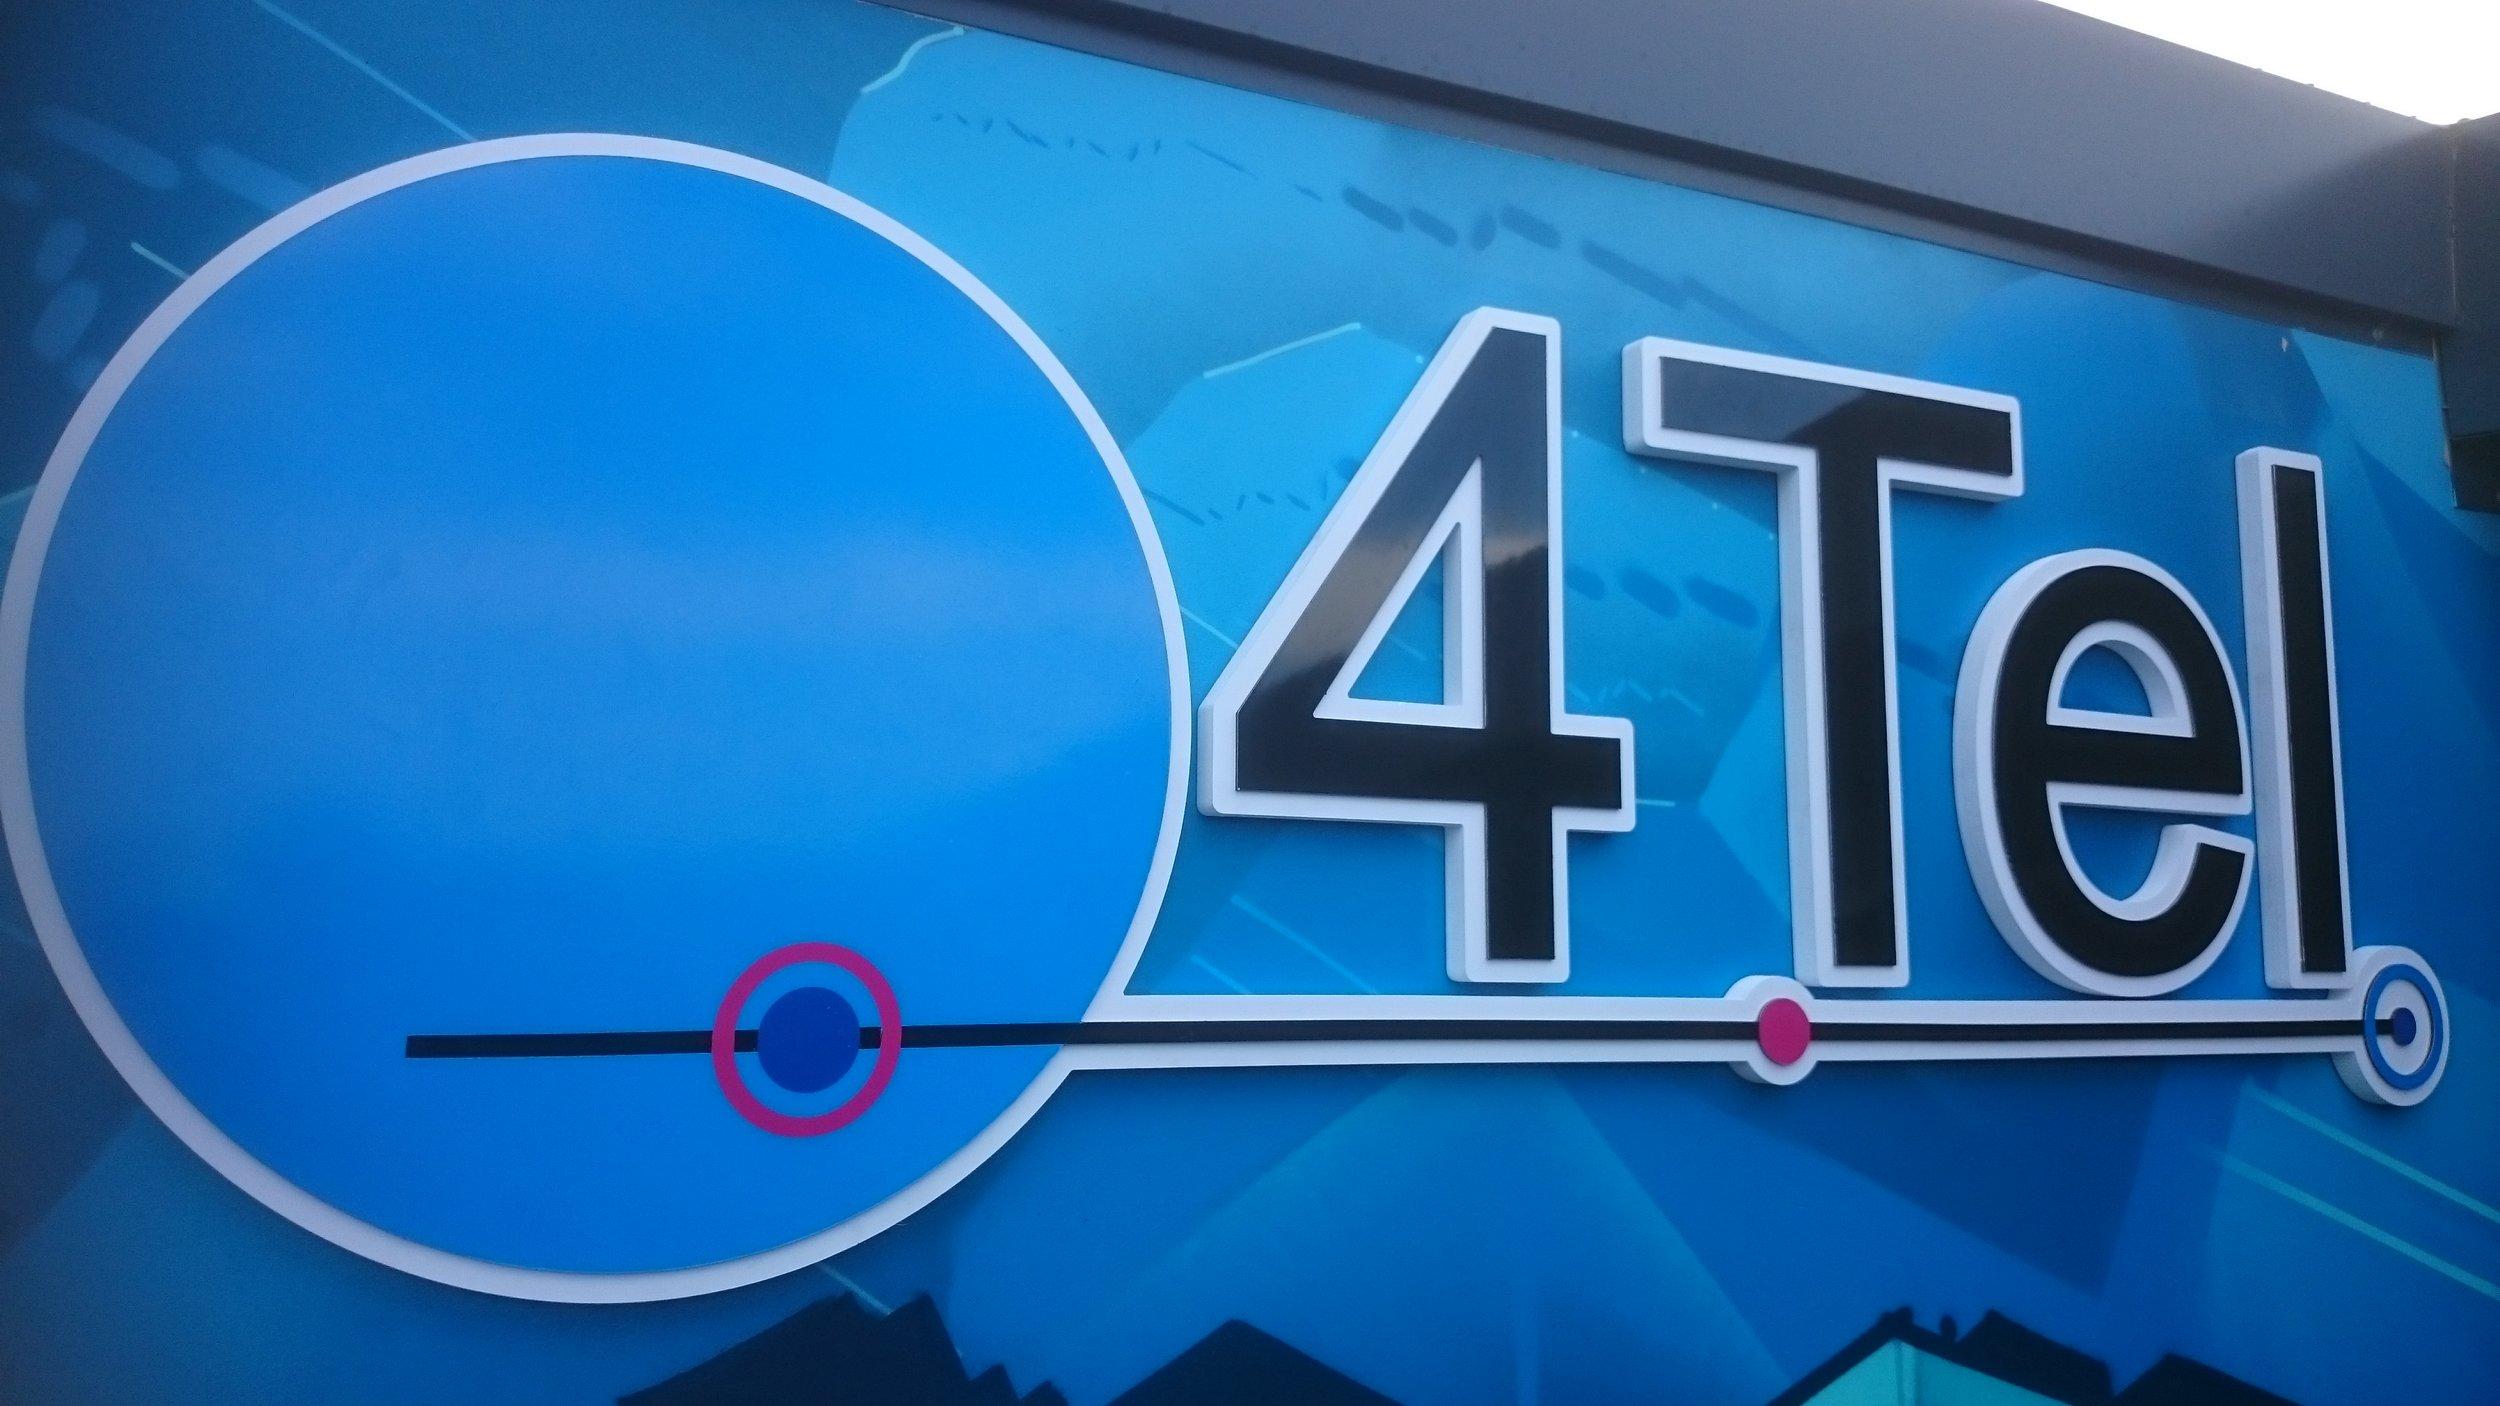 think graphic communication 4 tel sign.JPG